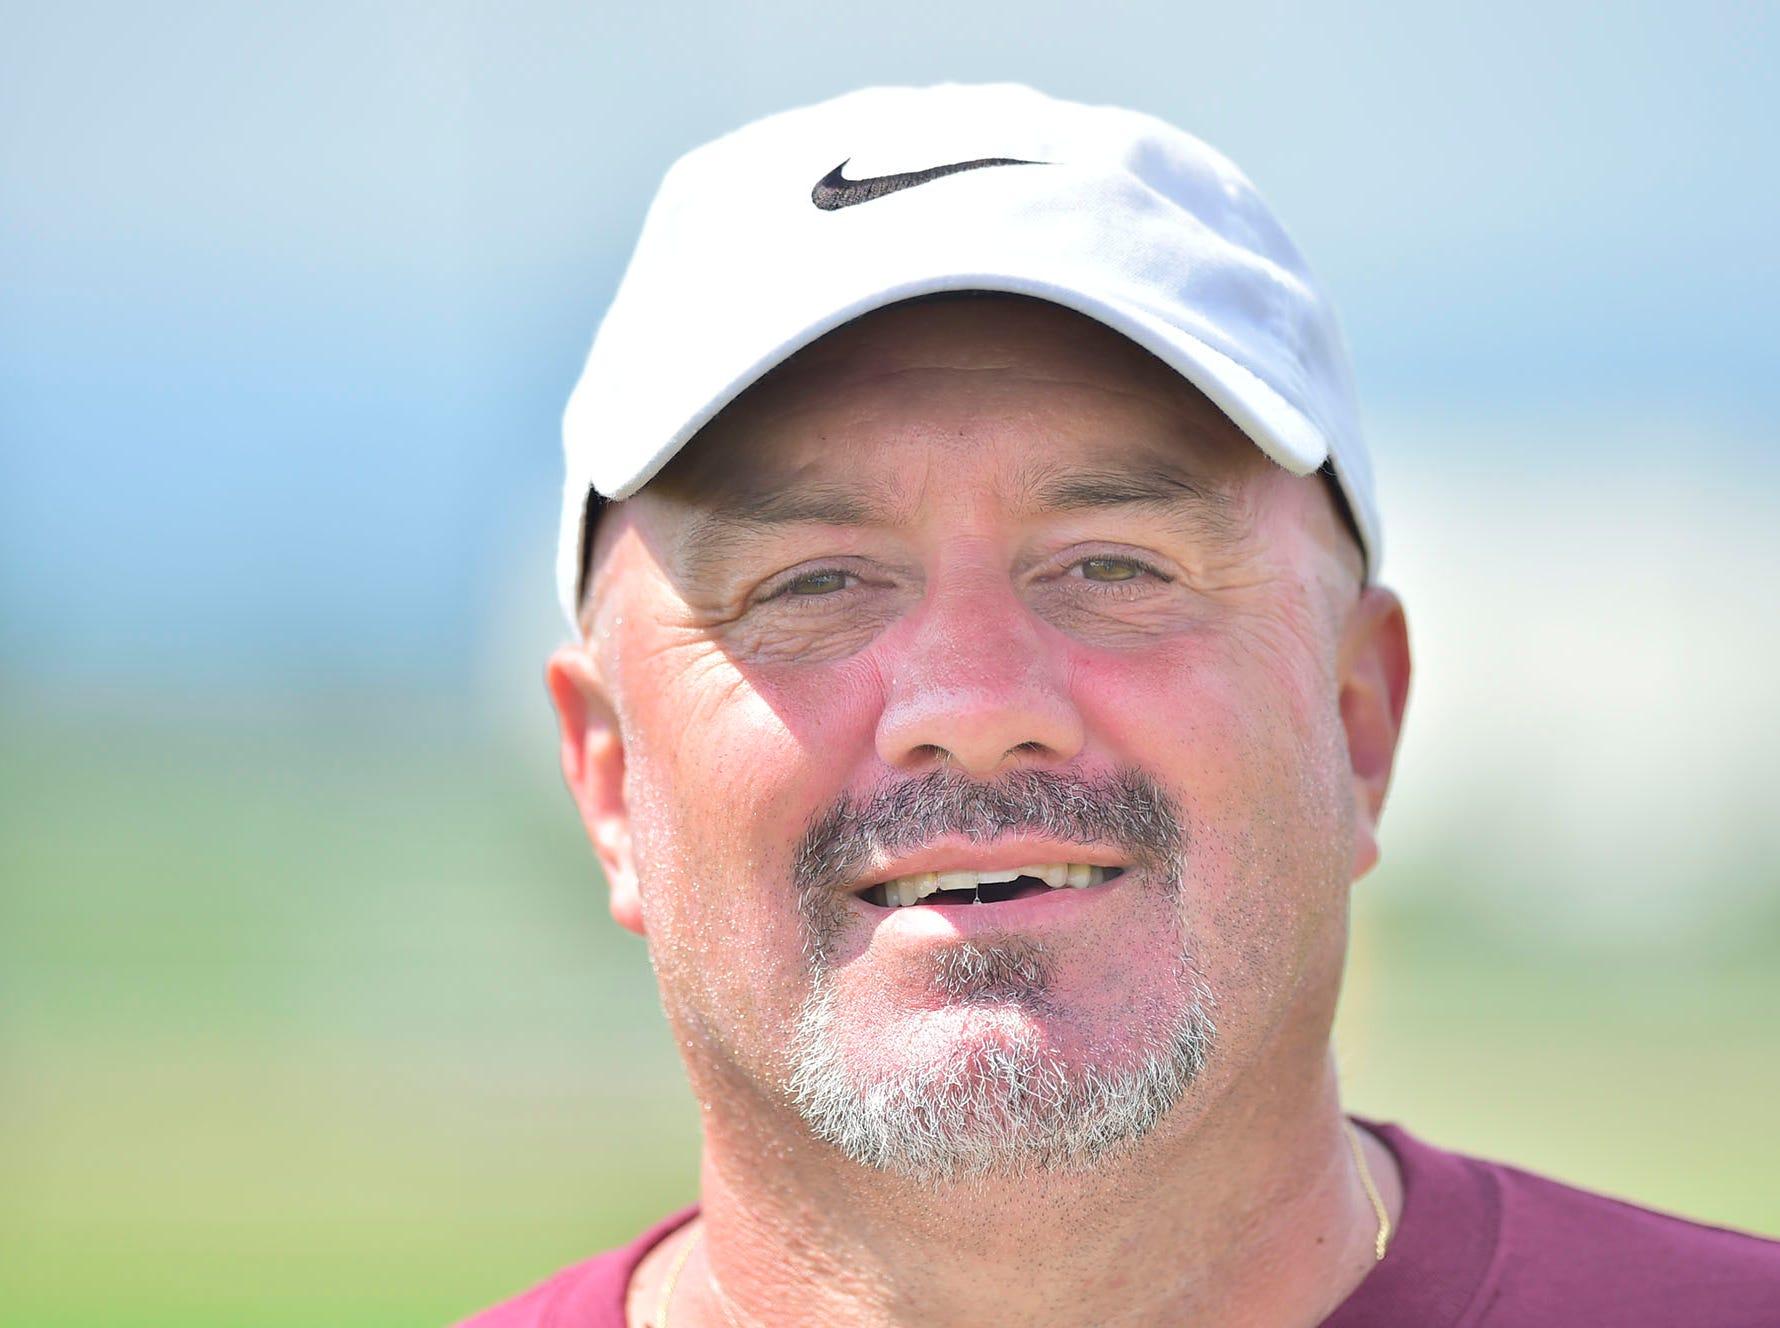 Eric Foust is back as Shippensburg Greyhound football coach. Shippensburg High School football players practice on Thursday, August 9, 2018.